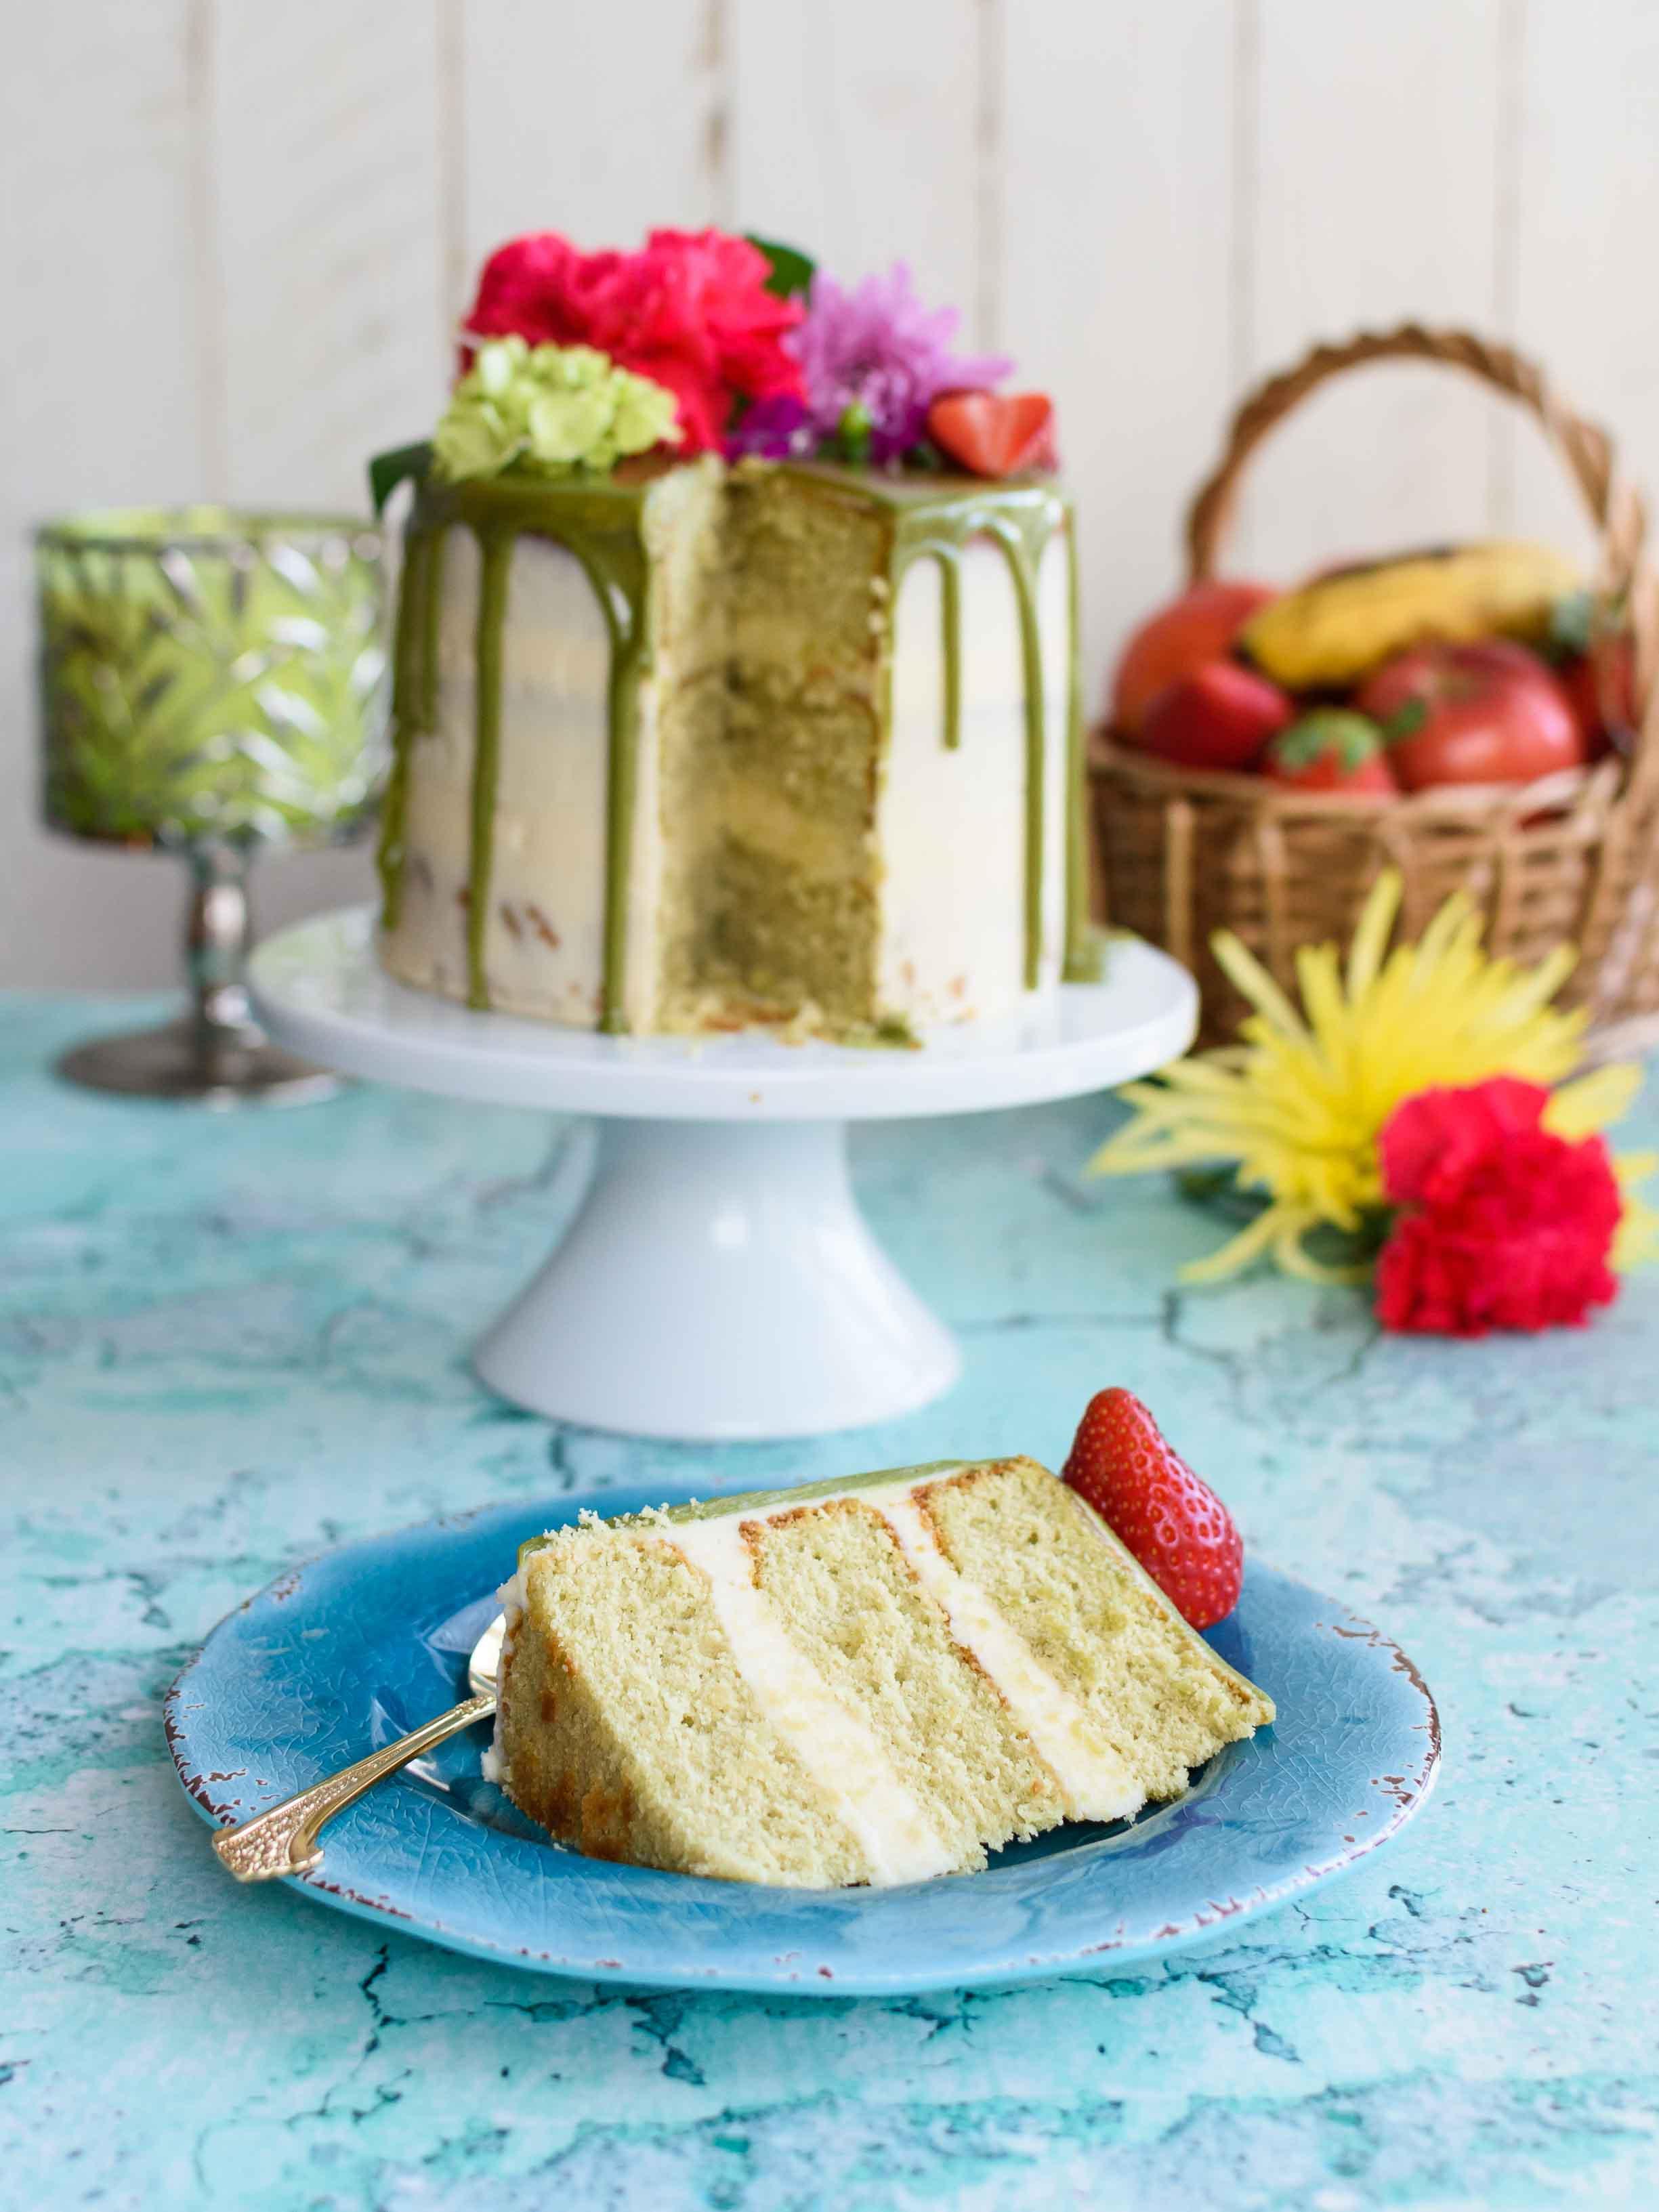 Matcha Cake with Buttercream Frosting and White Chocolate Matcha Drip - Pepper Delight #pepperdelightblog #recipe #cake #matchacake #greenteacake #birthdaycake #celebration #christmas #dessert #birthday #buttercream #party #matcha #japanesecake #seminakedcake #nakedcake #matchaganache #whitechocolateganache #bloganniversary #baking #kitchenaidusa